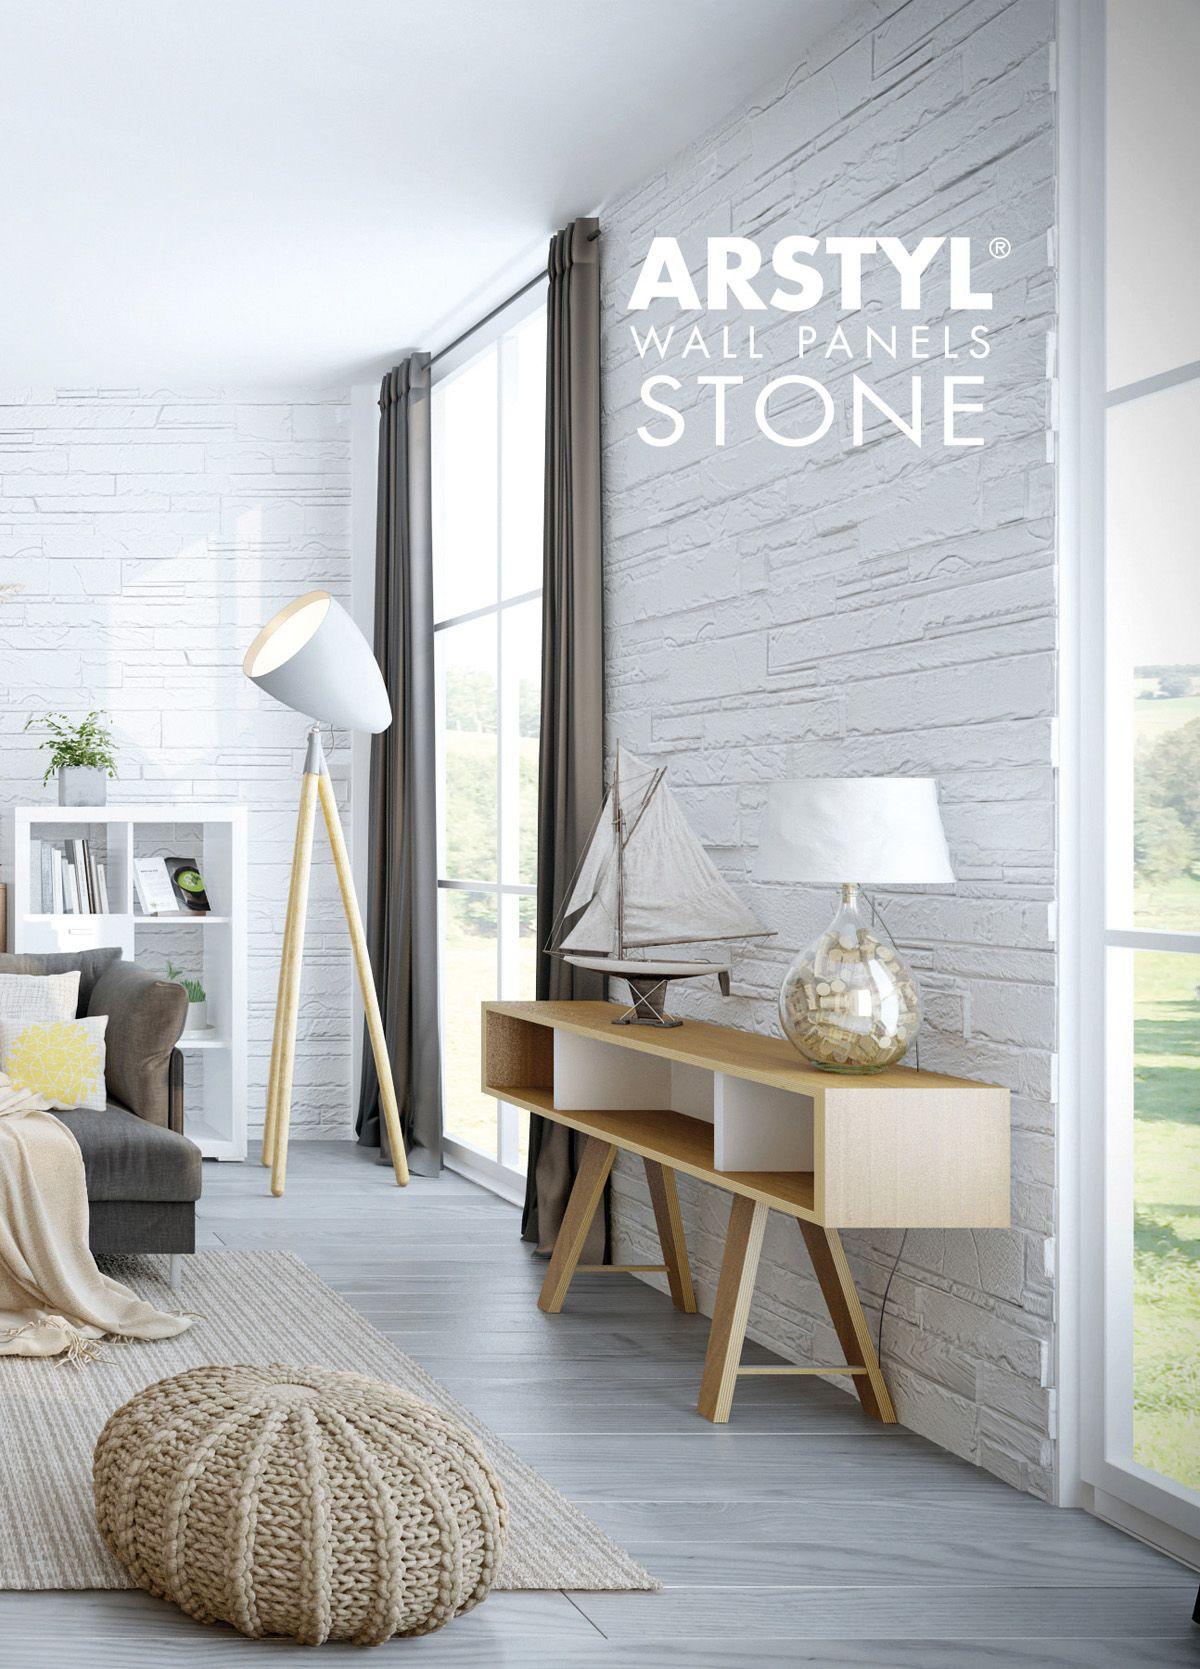 ARSTYLR Wall Panels STONE Livingroom